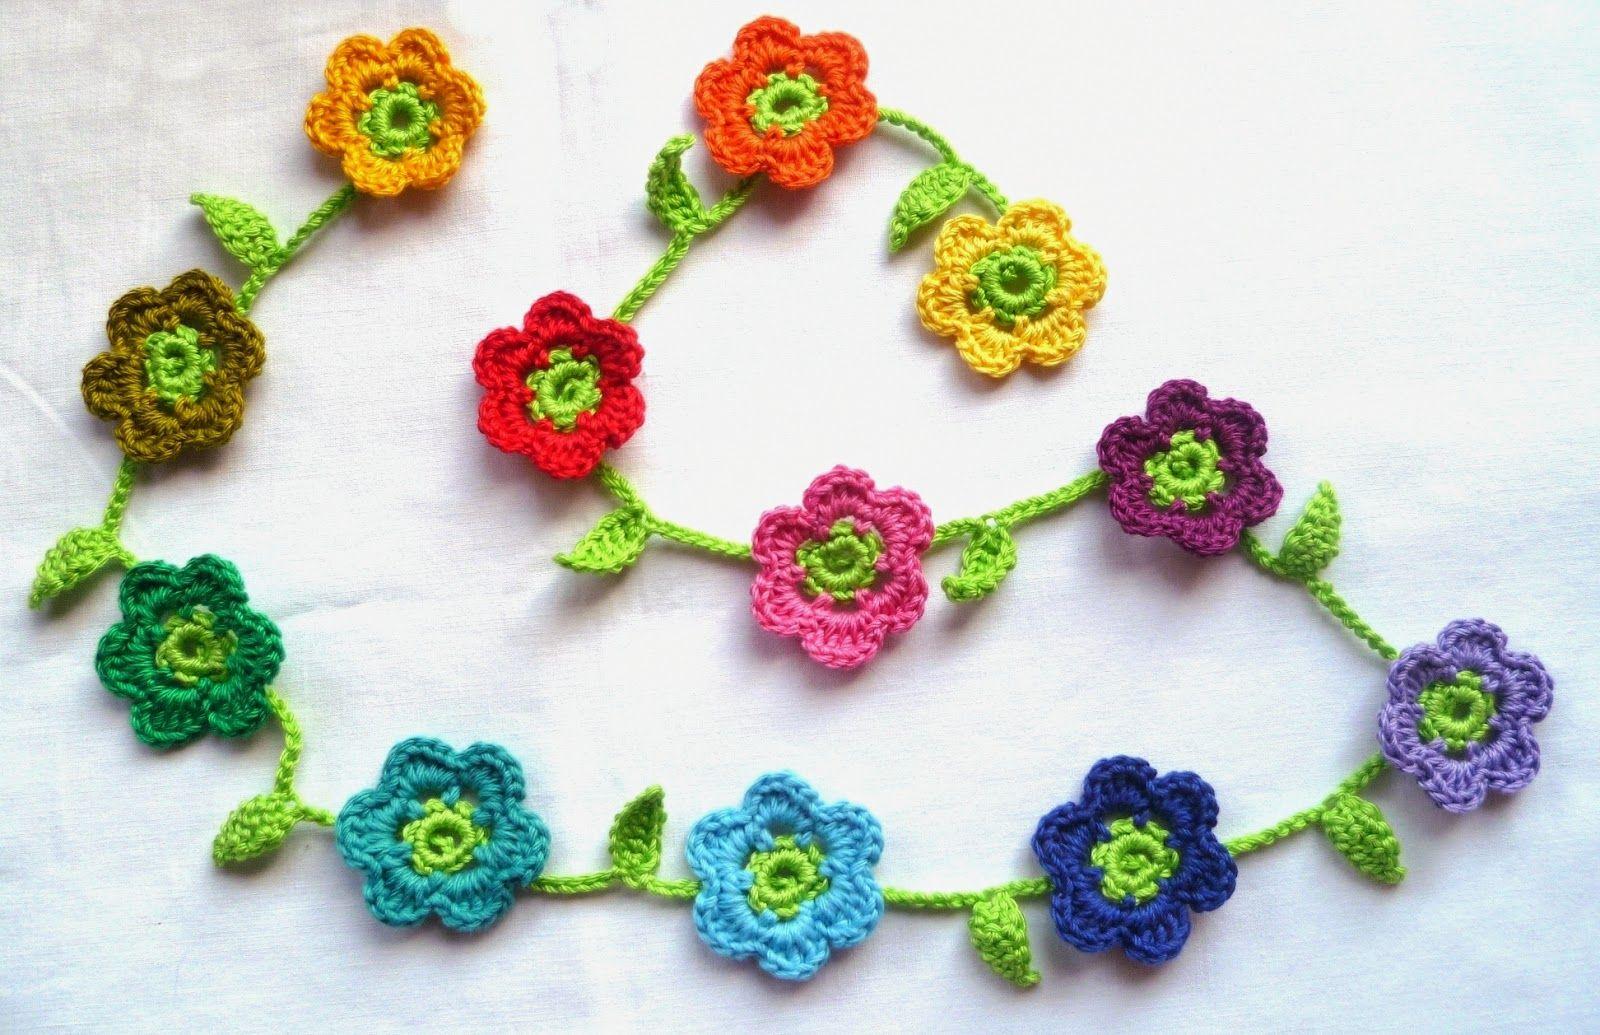 Blütengirlande - ♥ strickliese-kreativ ♥